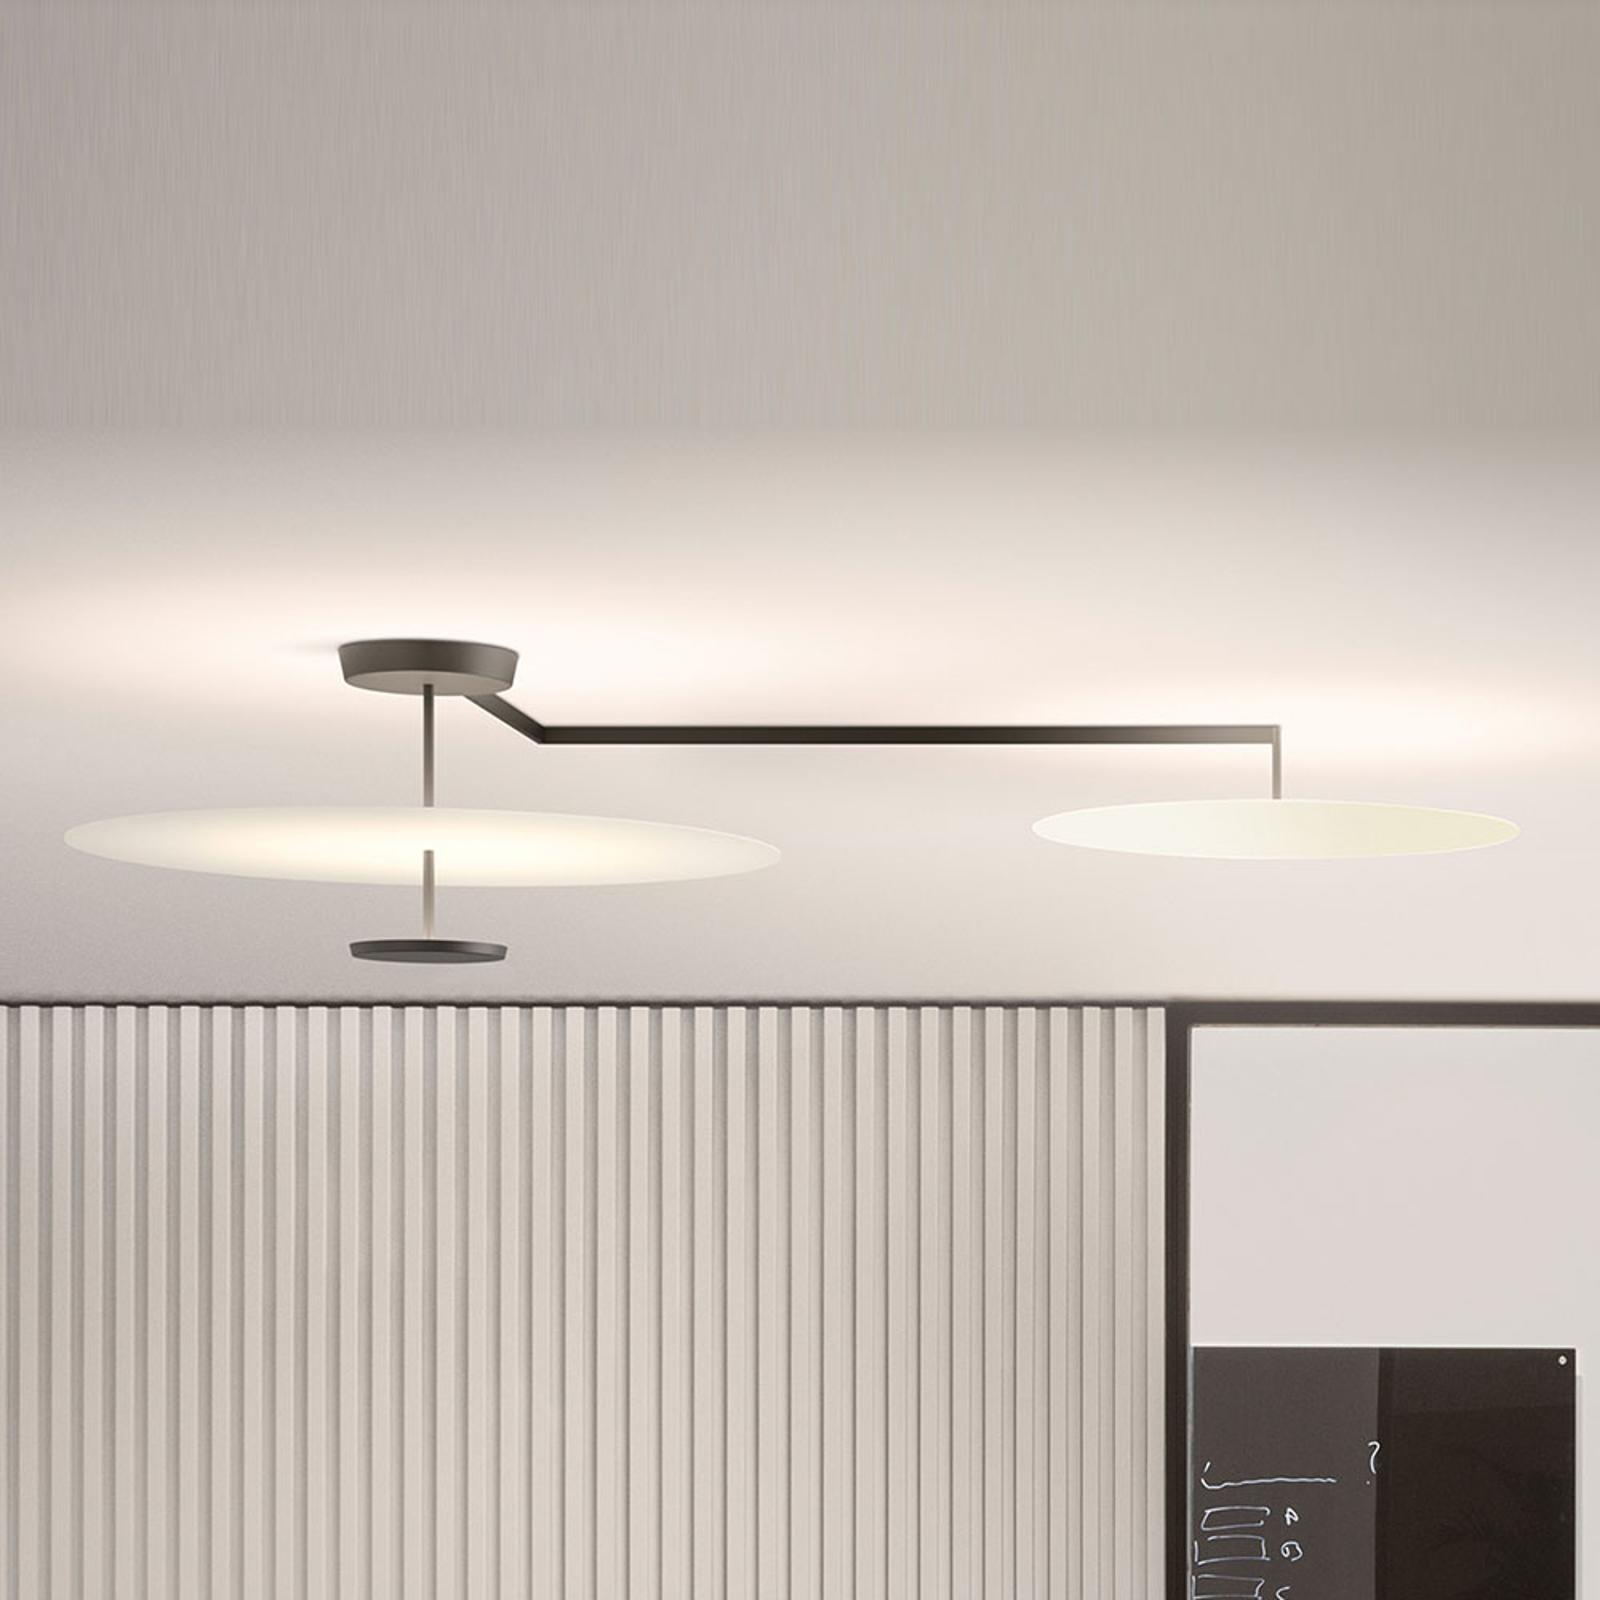 Vibia Flat LED-Deckenleuchte 3-flg. Ø 55 cm weiß